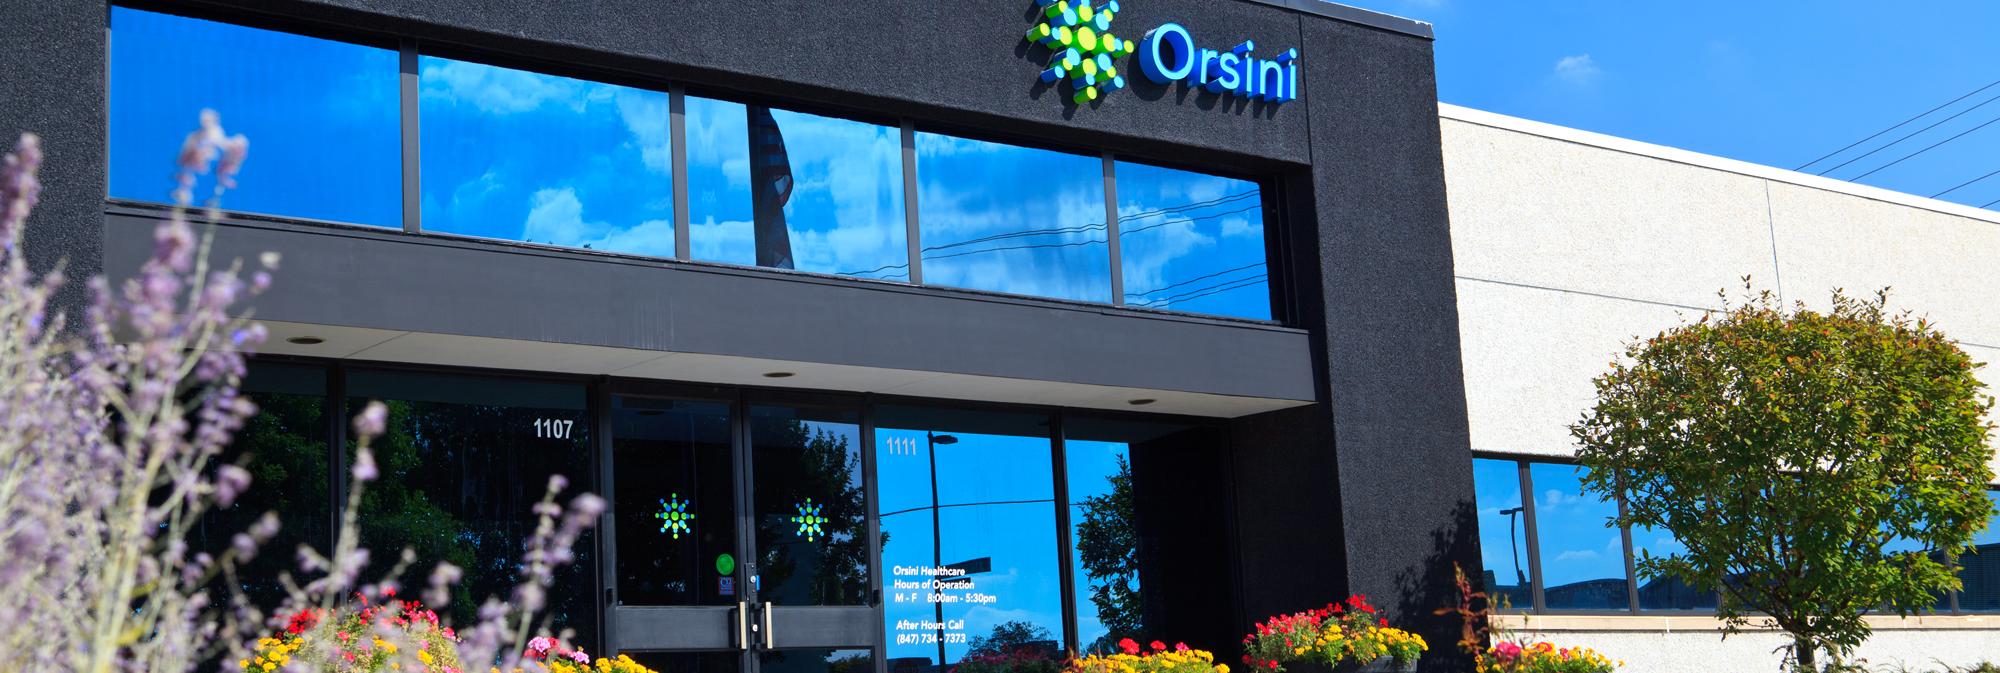 About Orsini